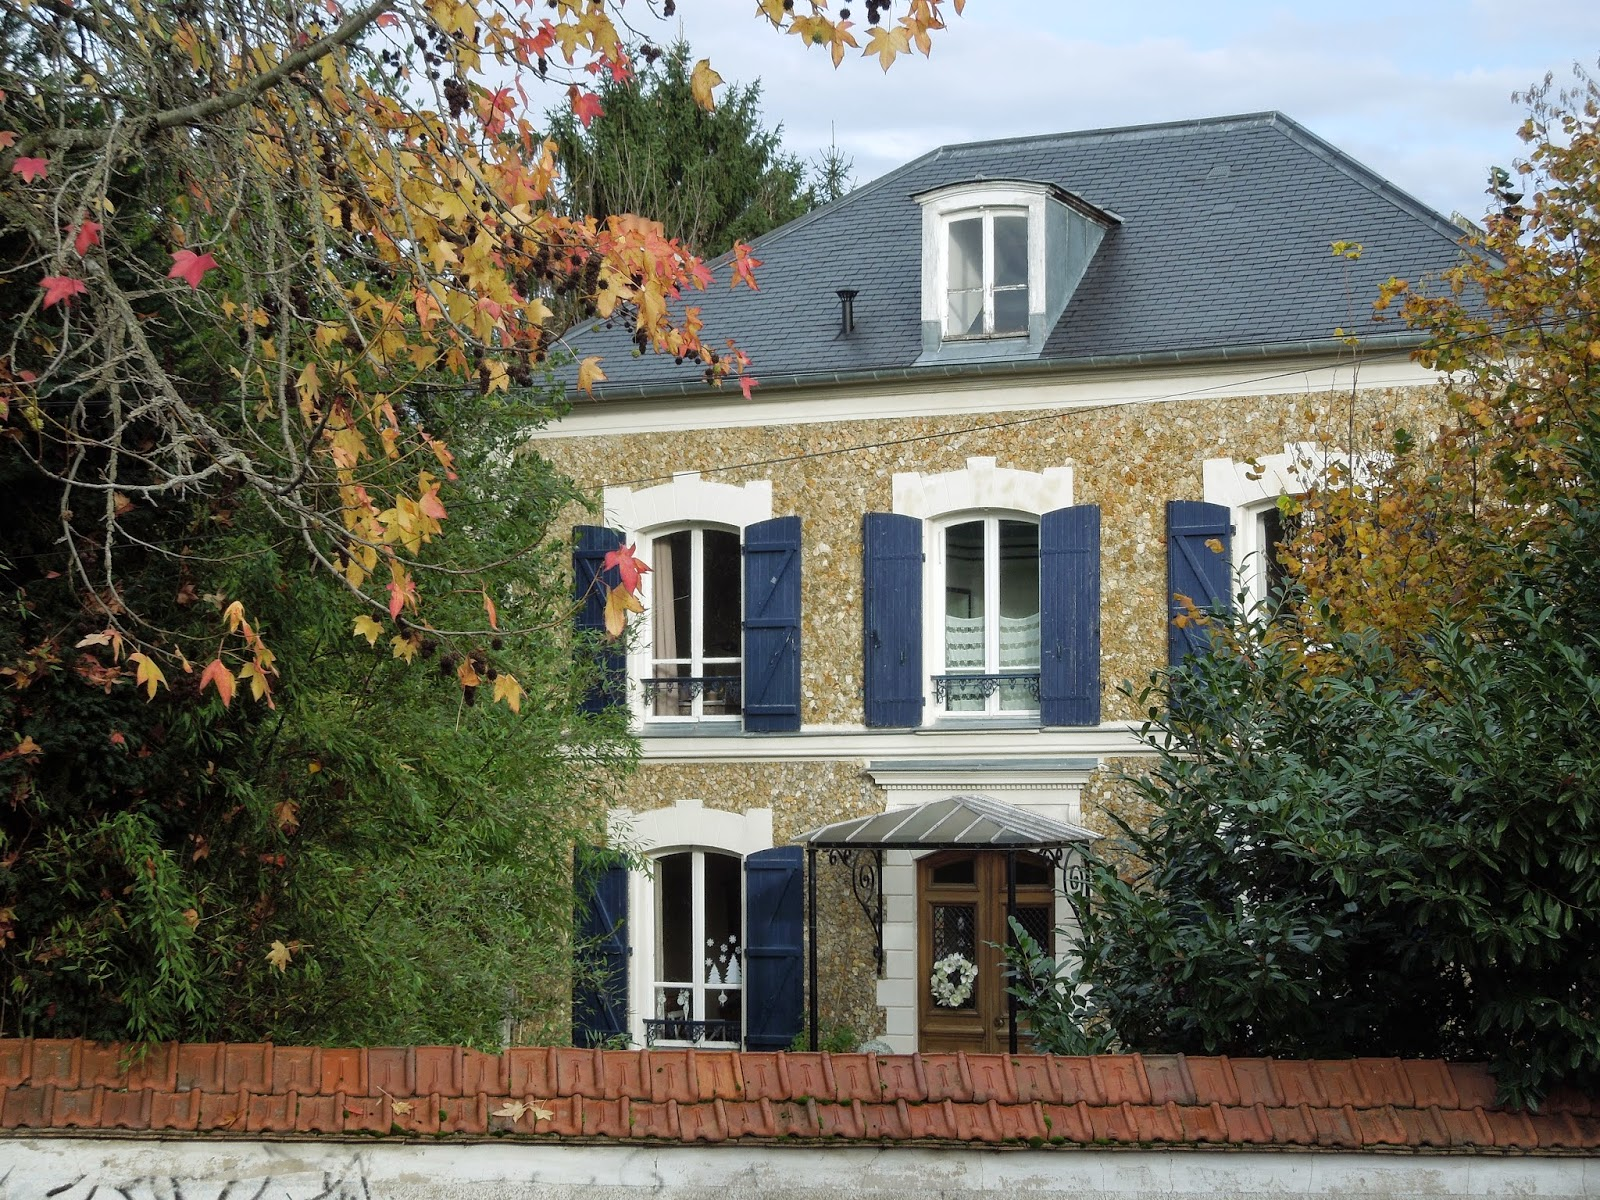 Maison a sceaux segu maison - Piscine chatenay malabry ...